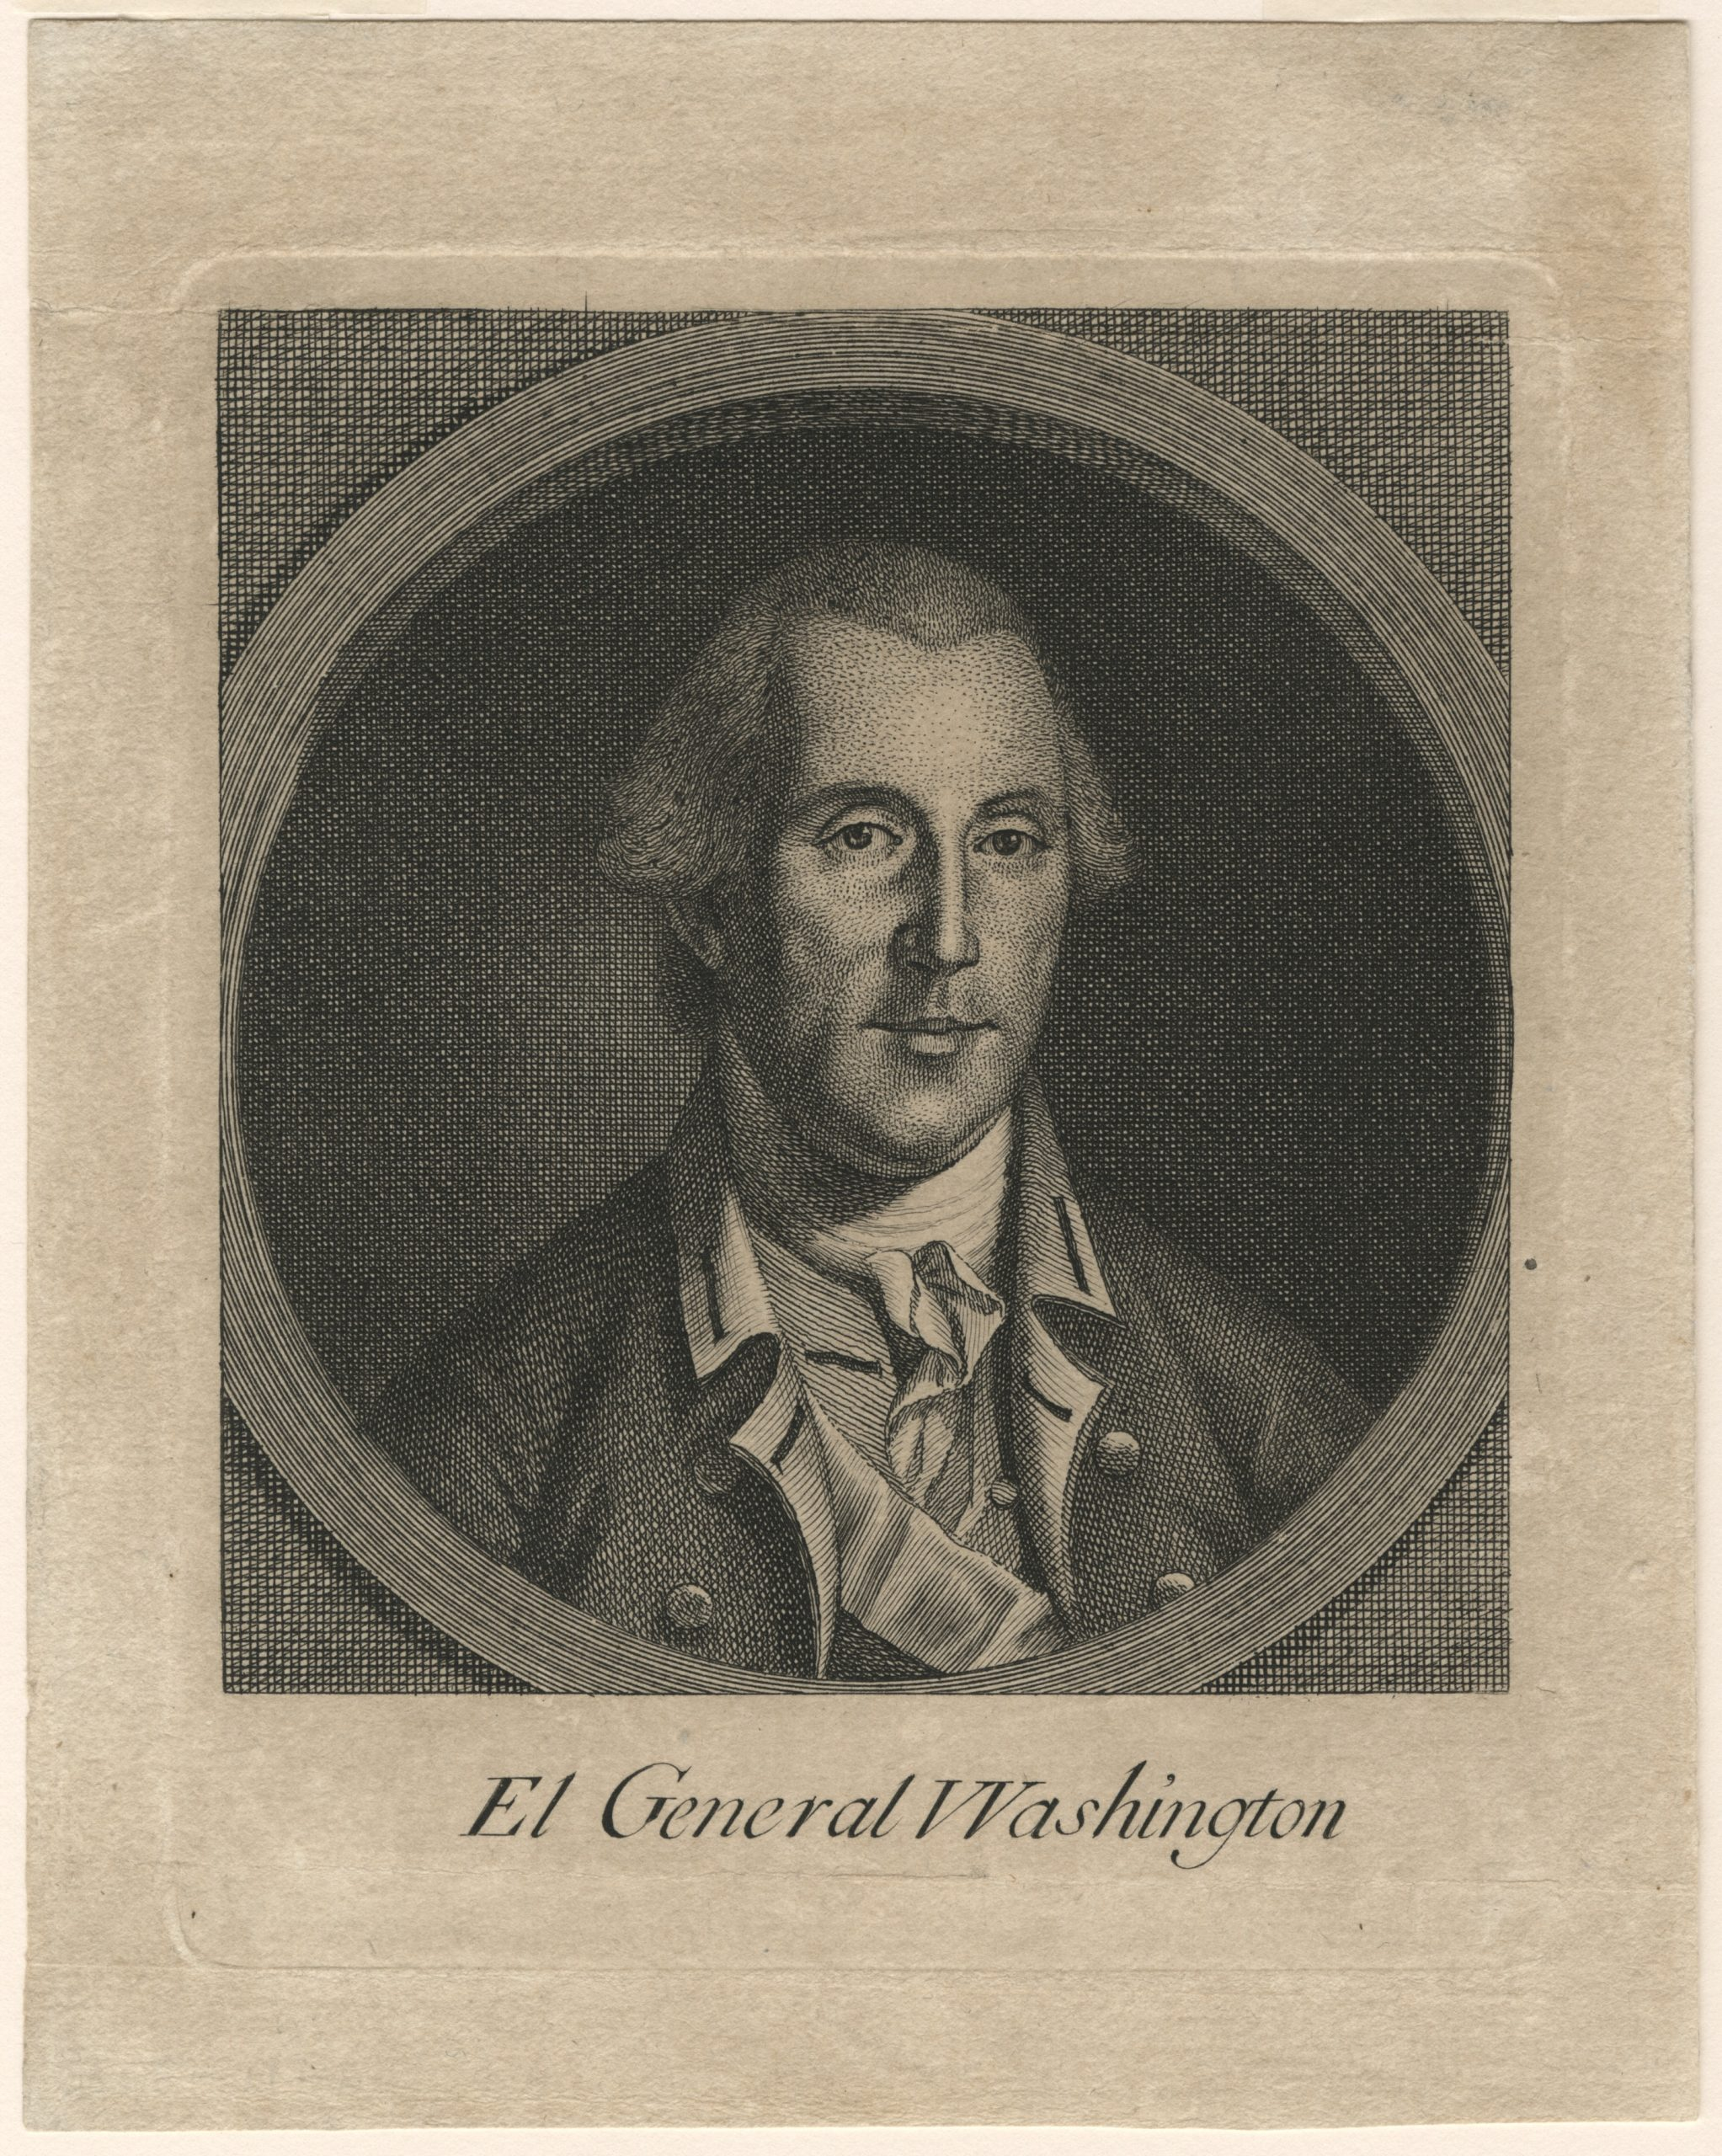 El General Washington is among the rarest prints of George Washington.